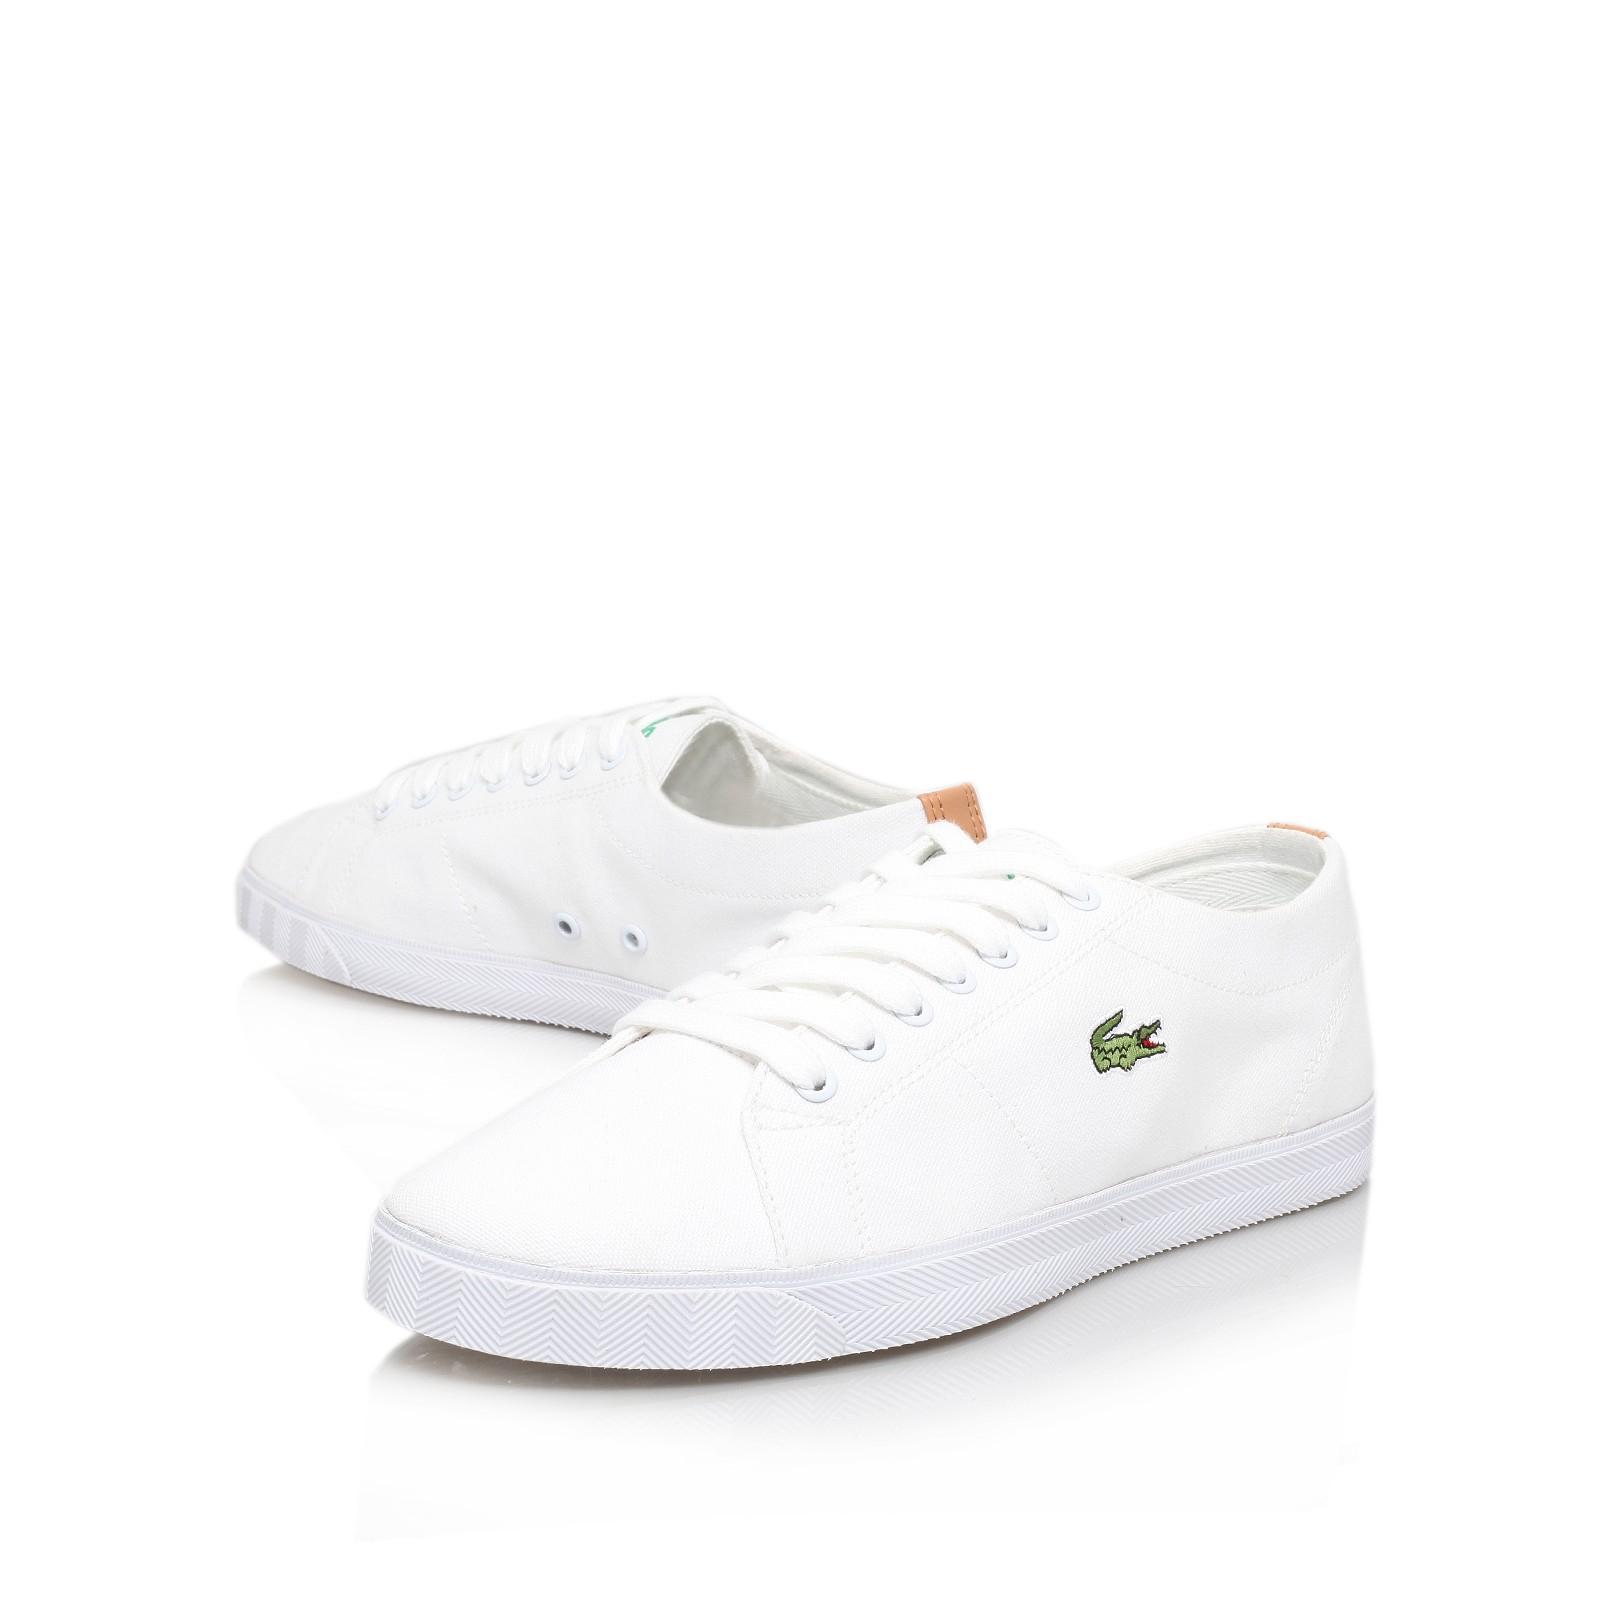 022b00f54ce51 Lacoste Marcel Eos Plimsol in White for Men - Lyst